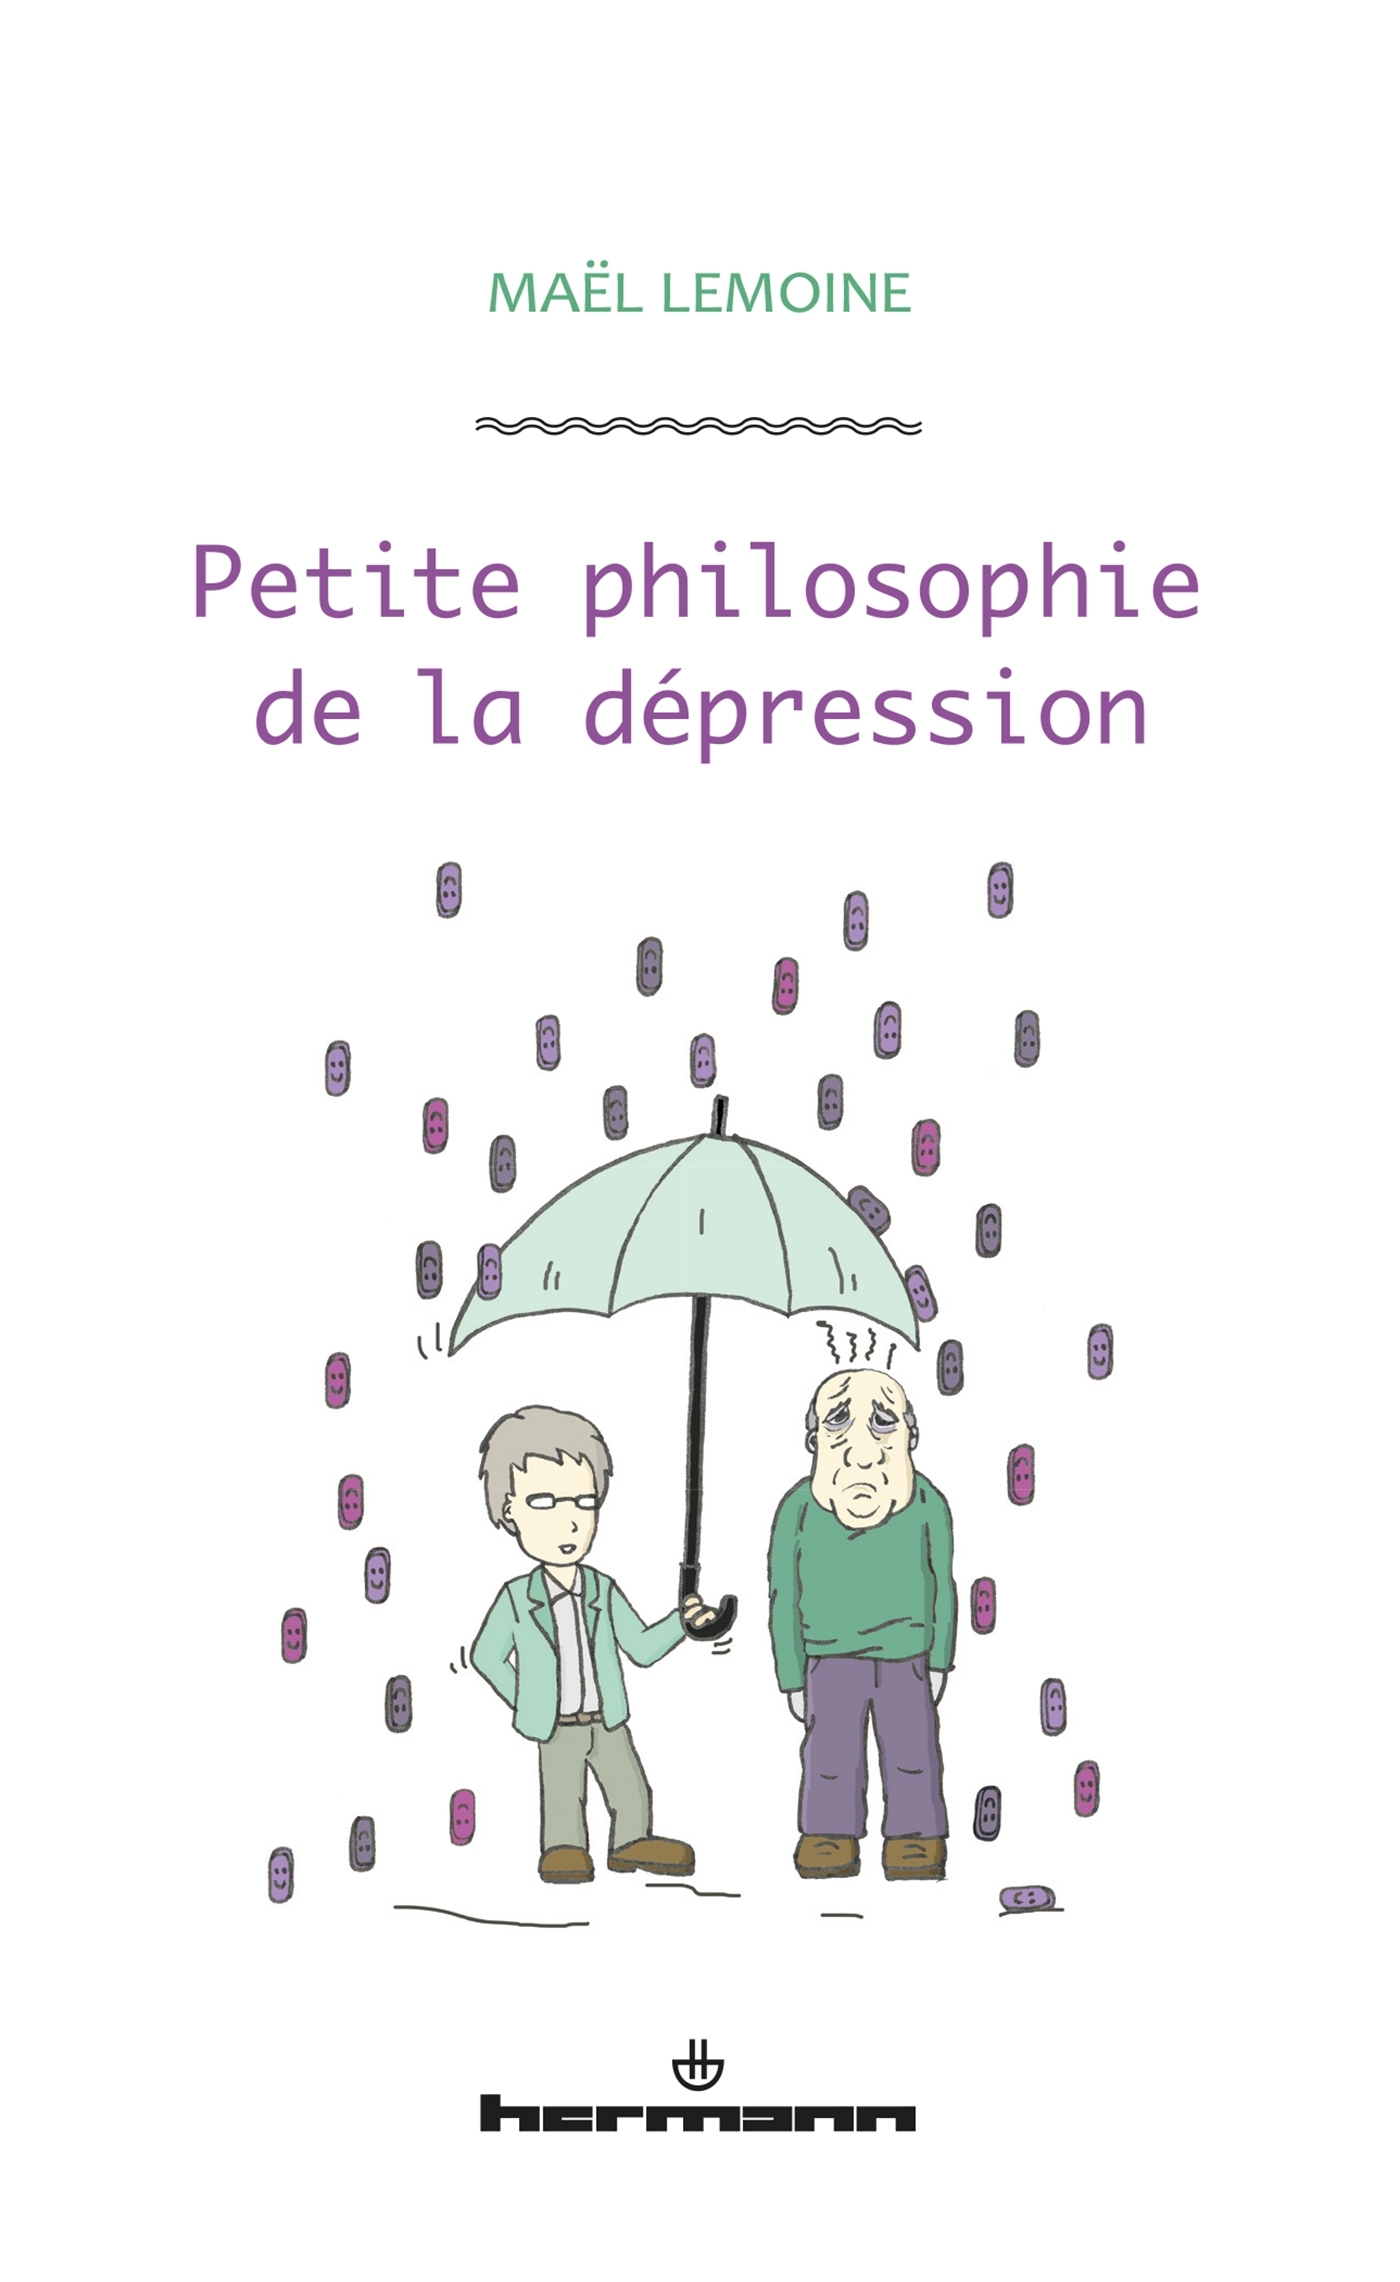 PETITE PHILOSOPHIE DE LA DEPRESSION